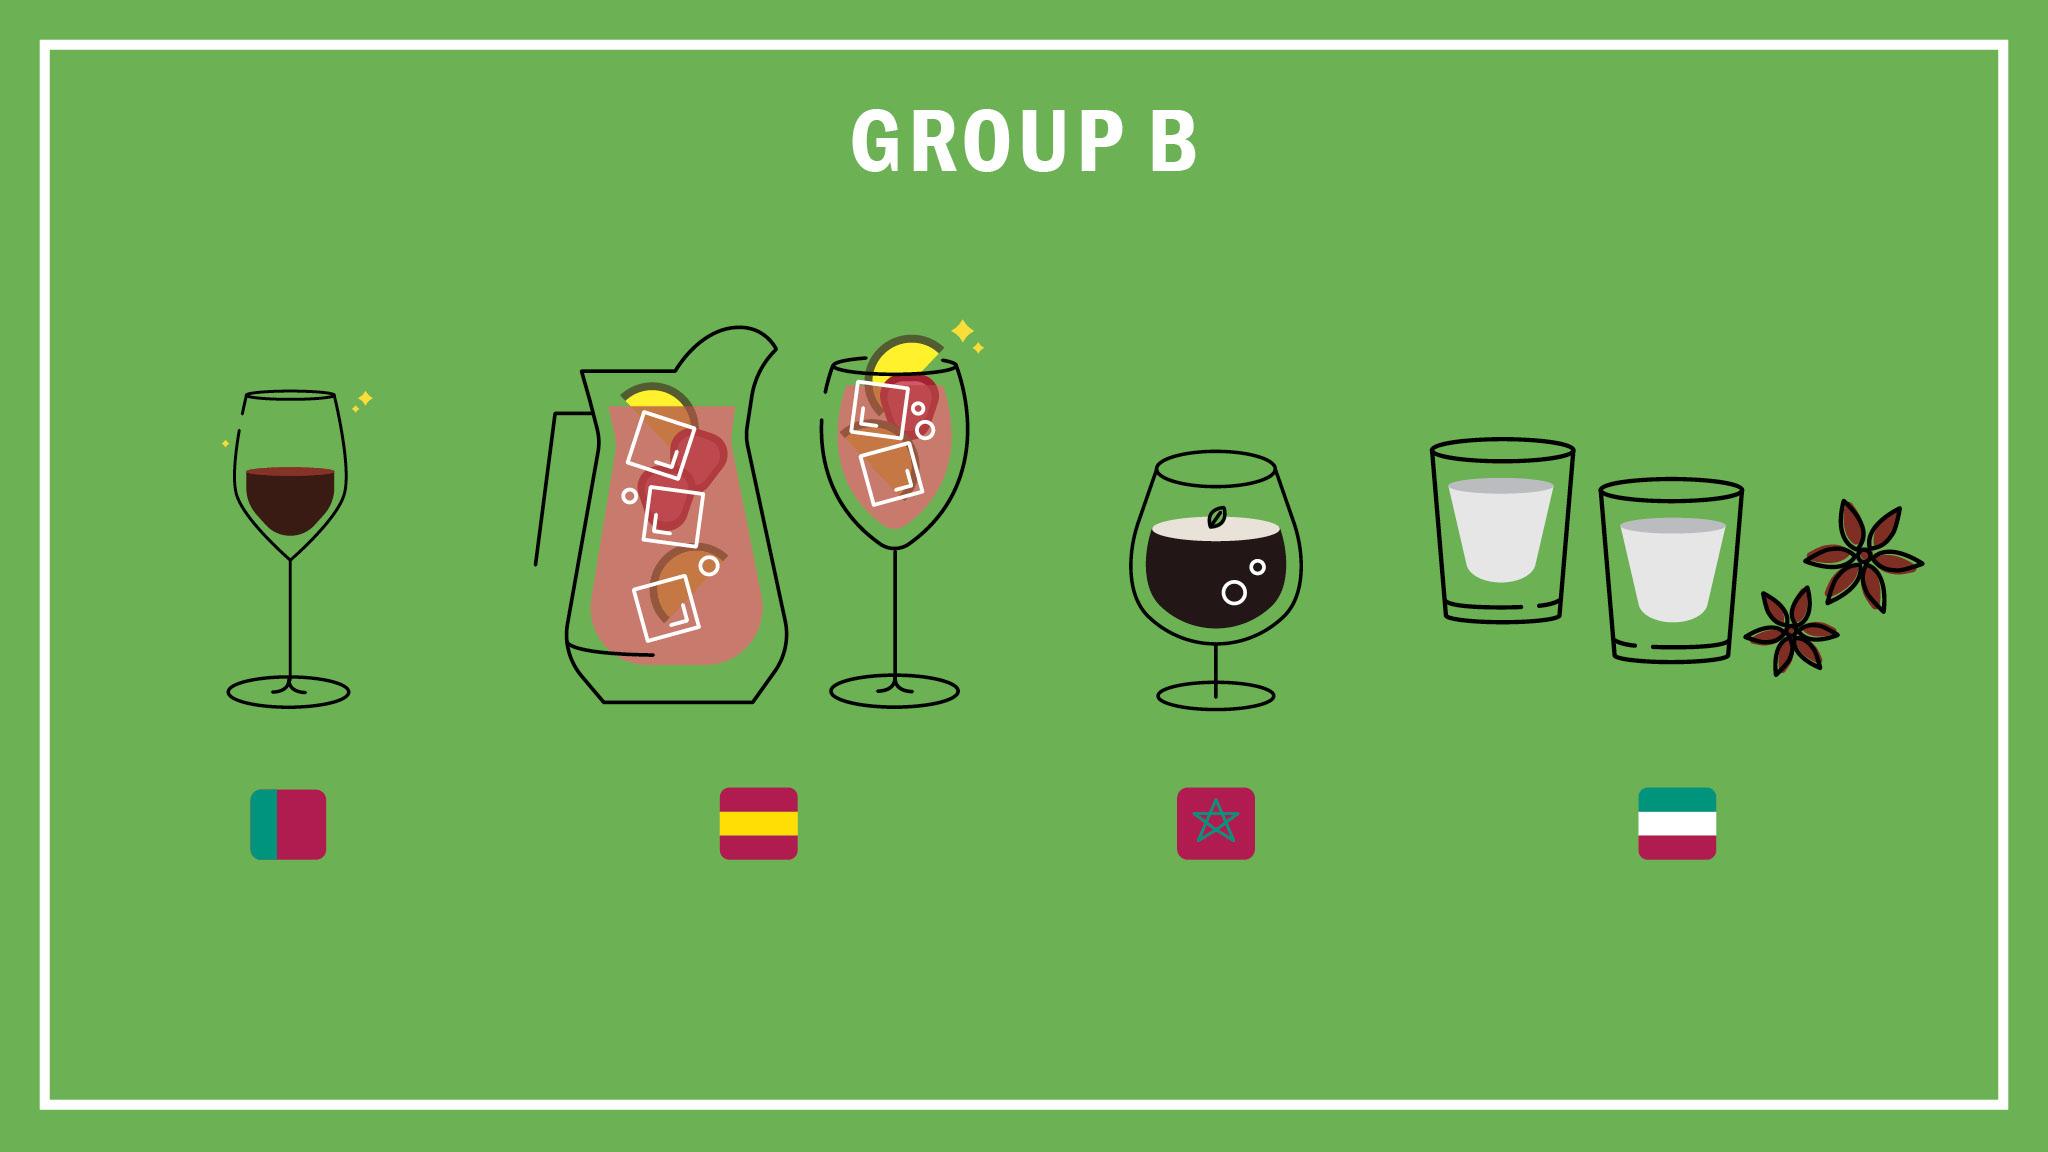 2018 World Cup Group B